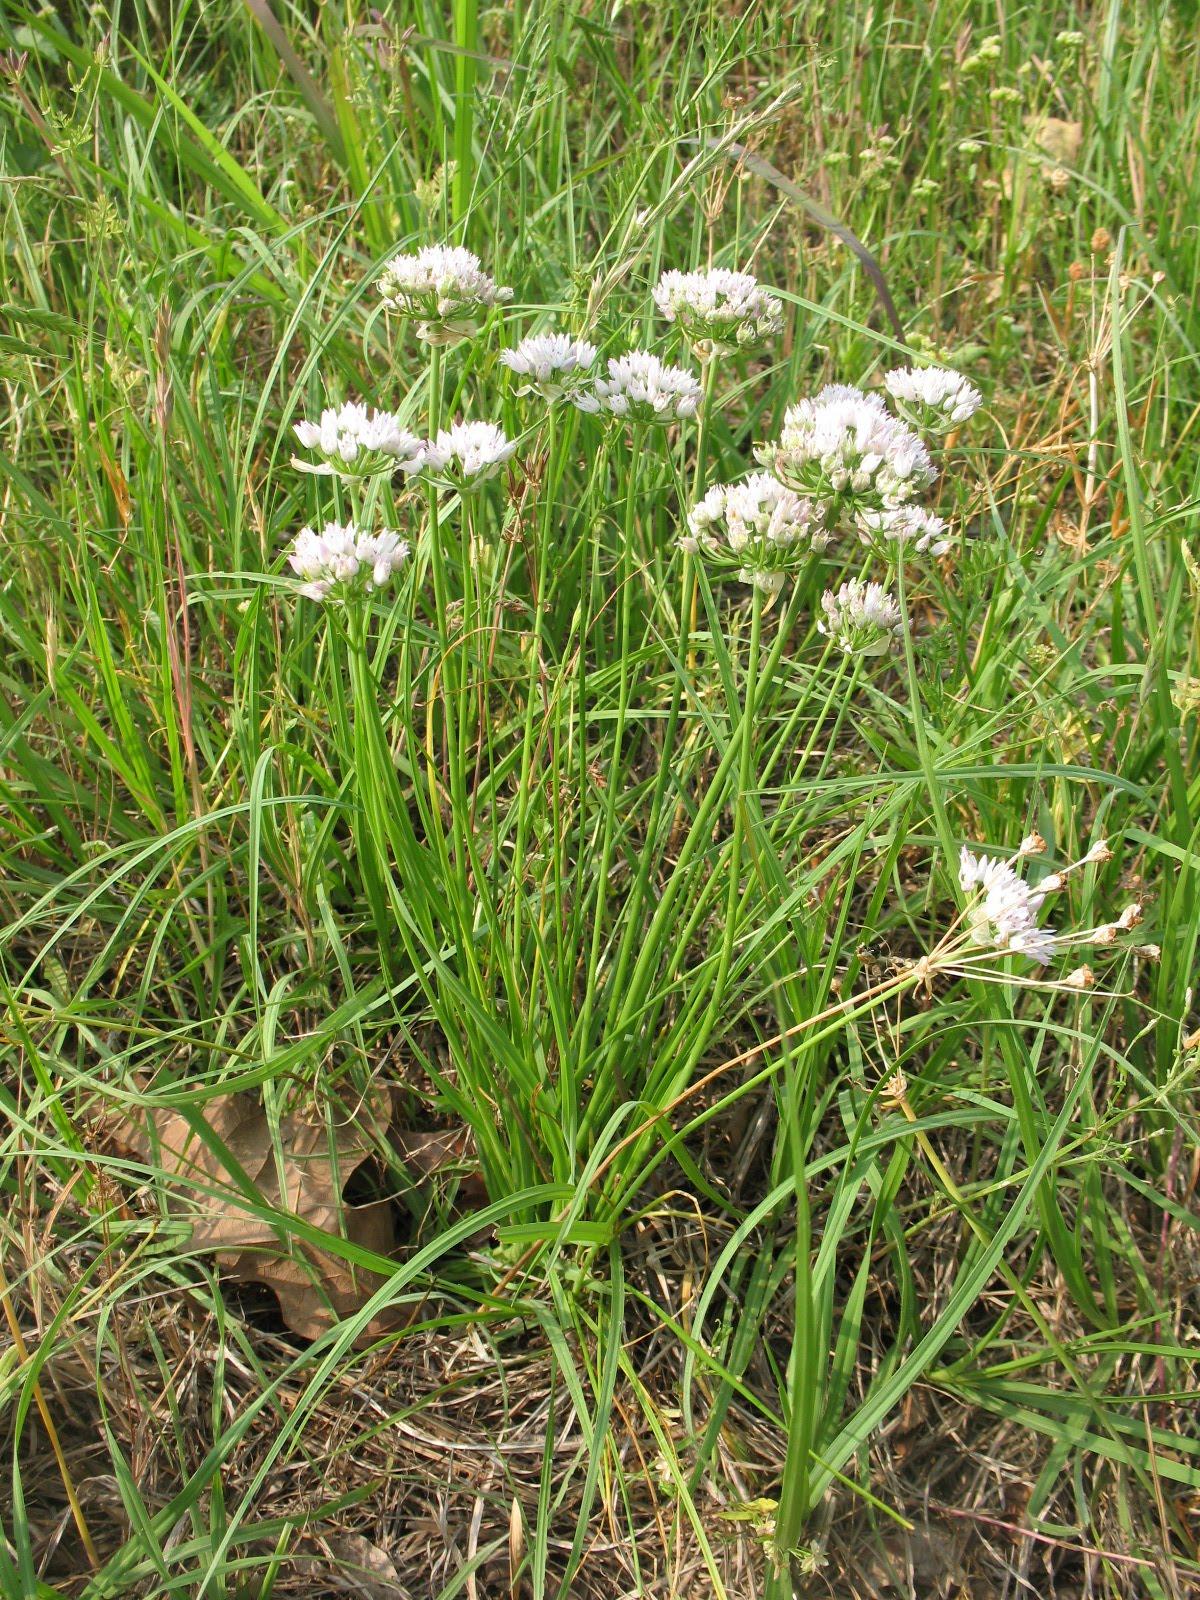 Edible Wild Plants Wild Onions Sensible Survival